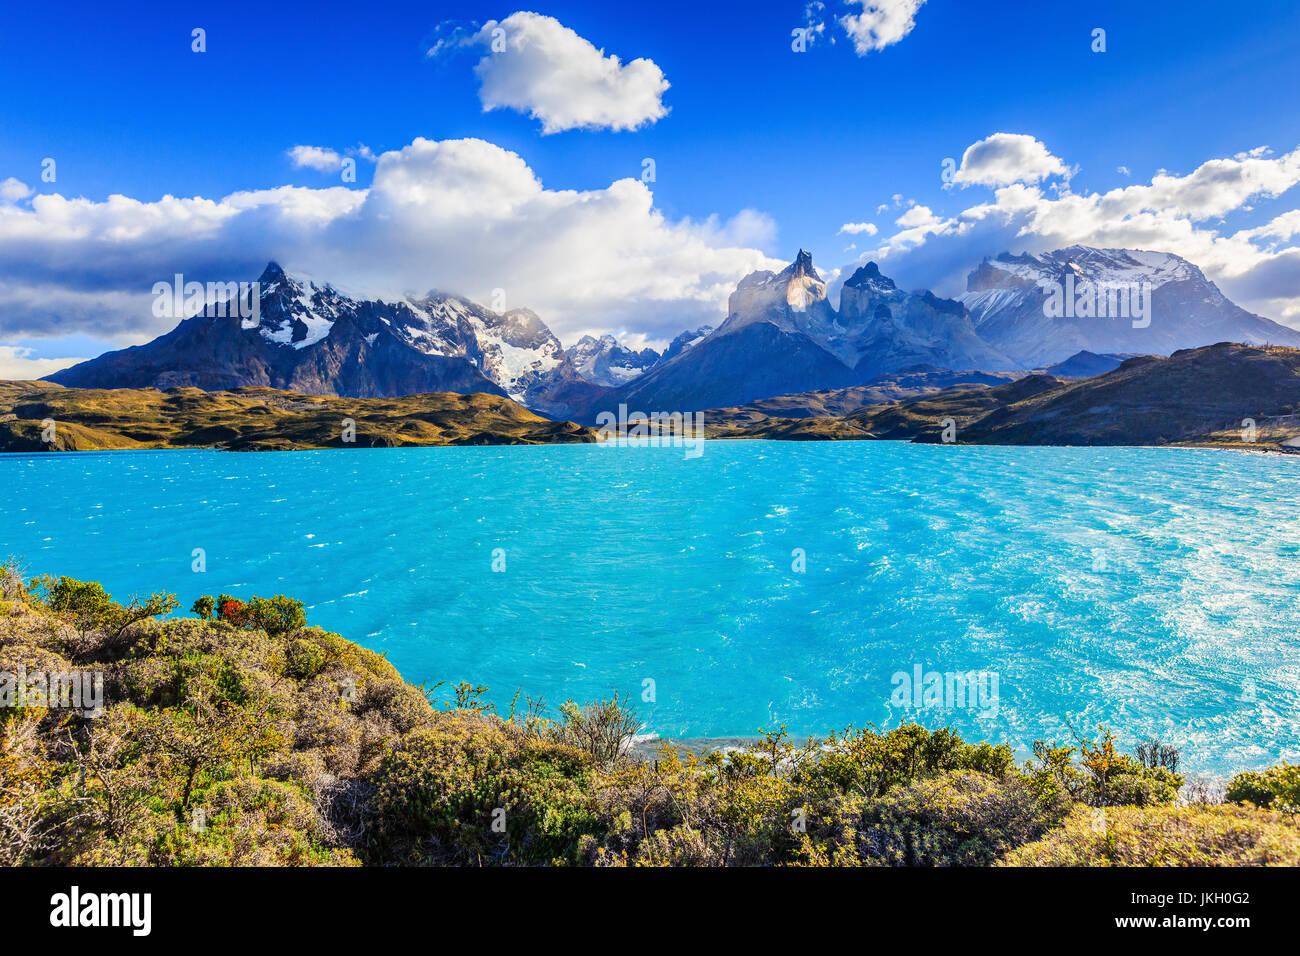 Parco Nazionale di Torres del Paine Cile. Lago Pehoe. Immagini Stock